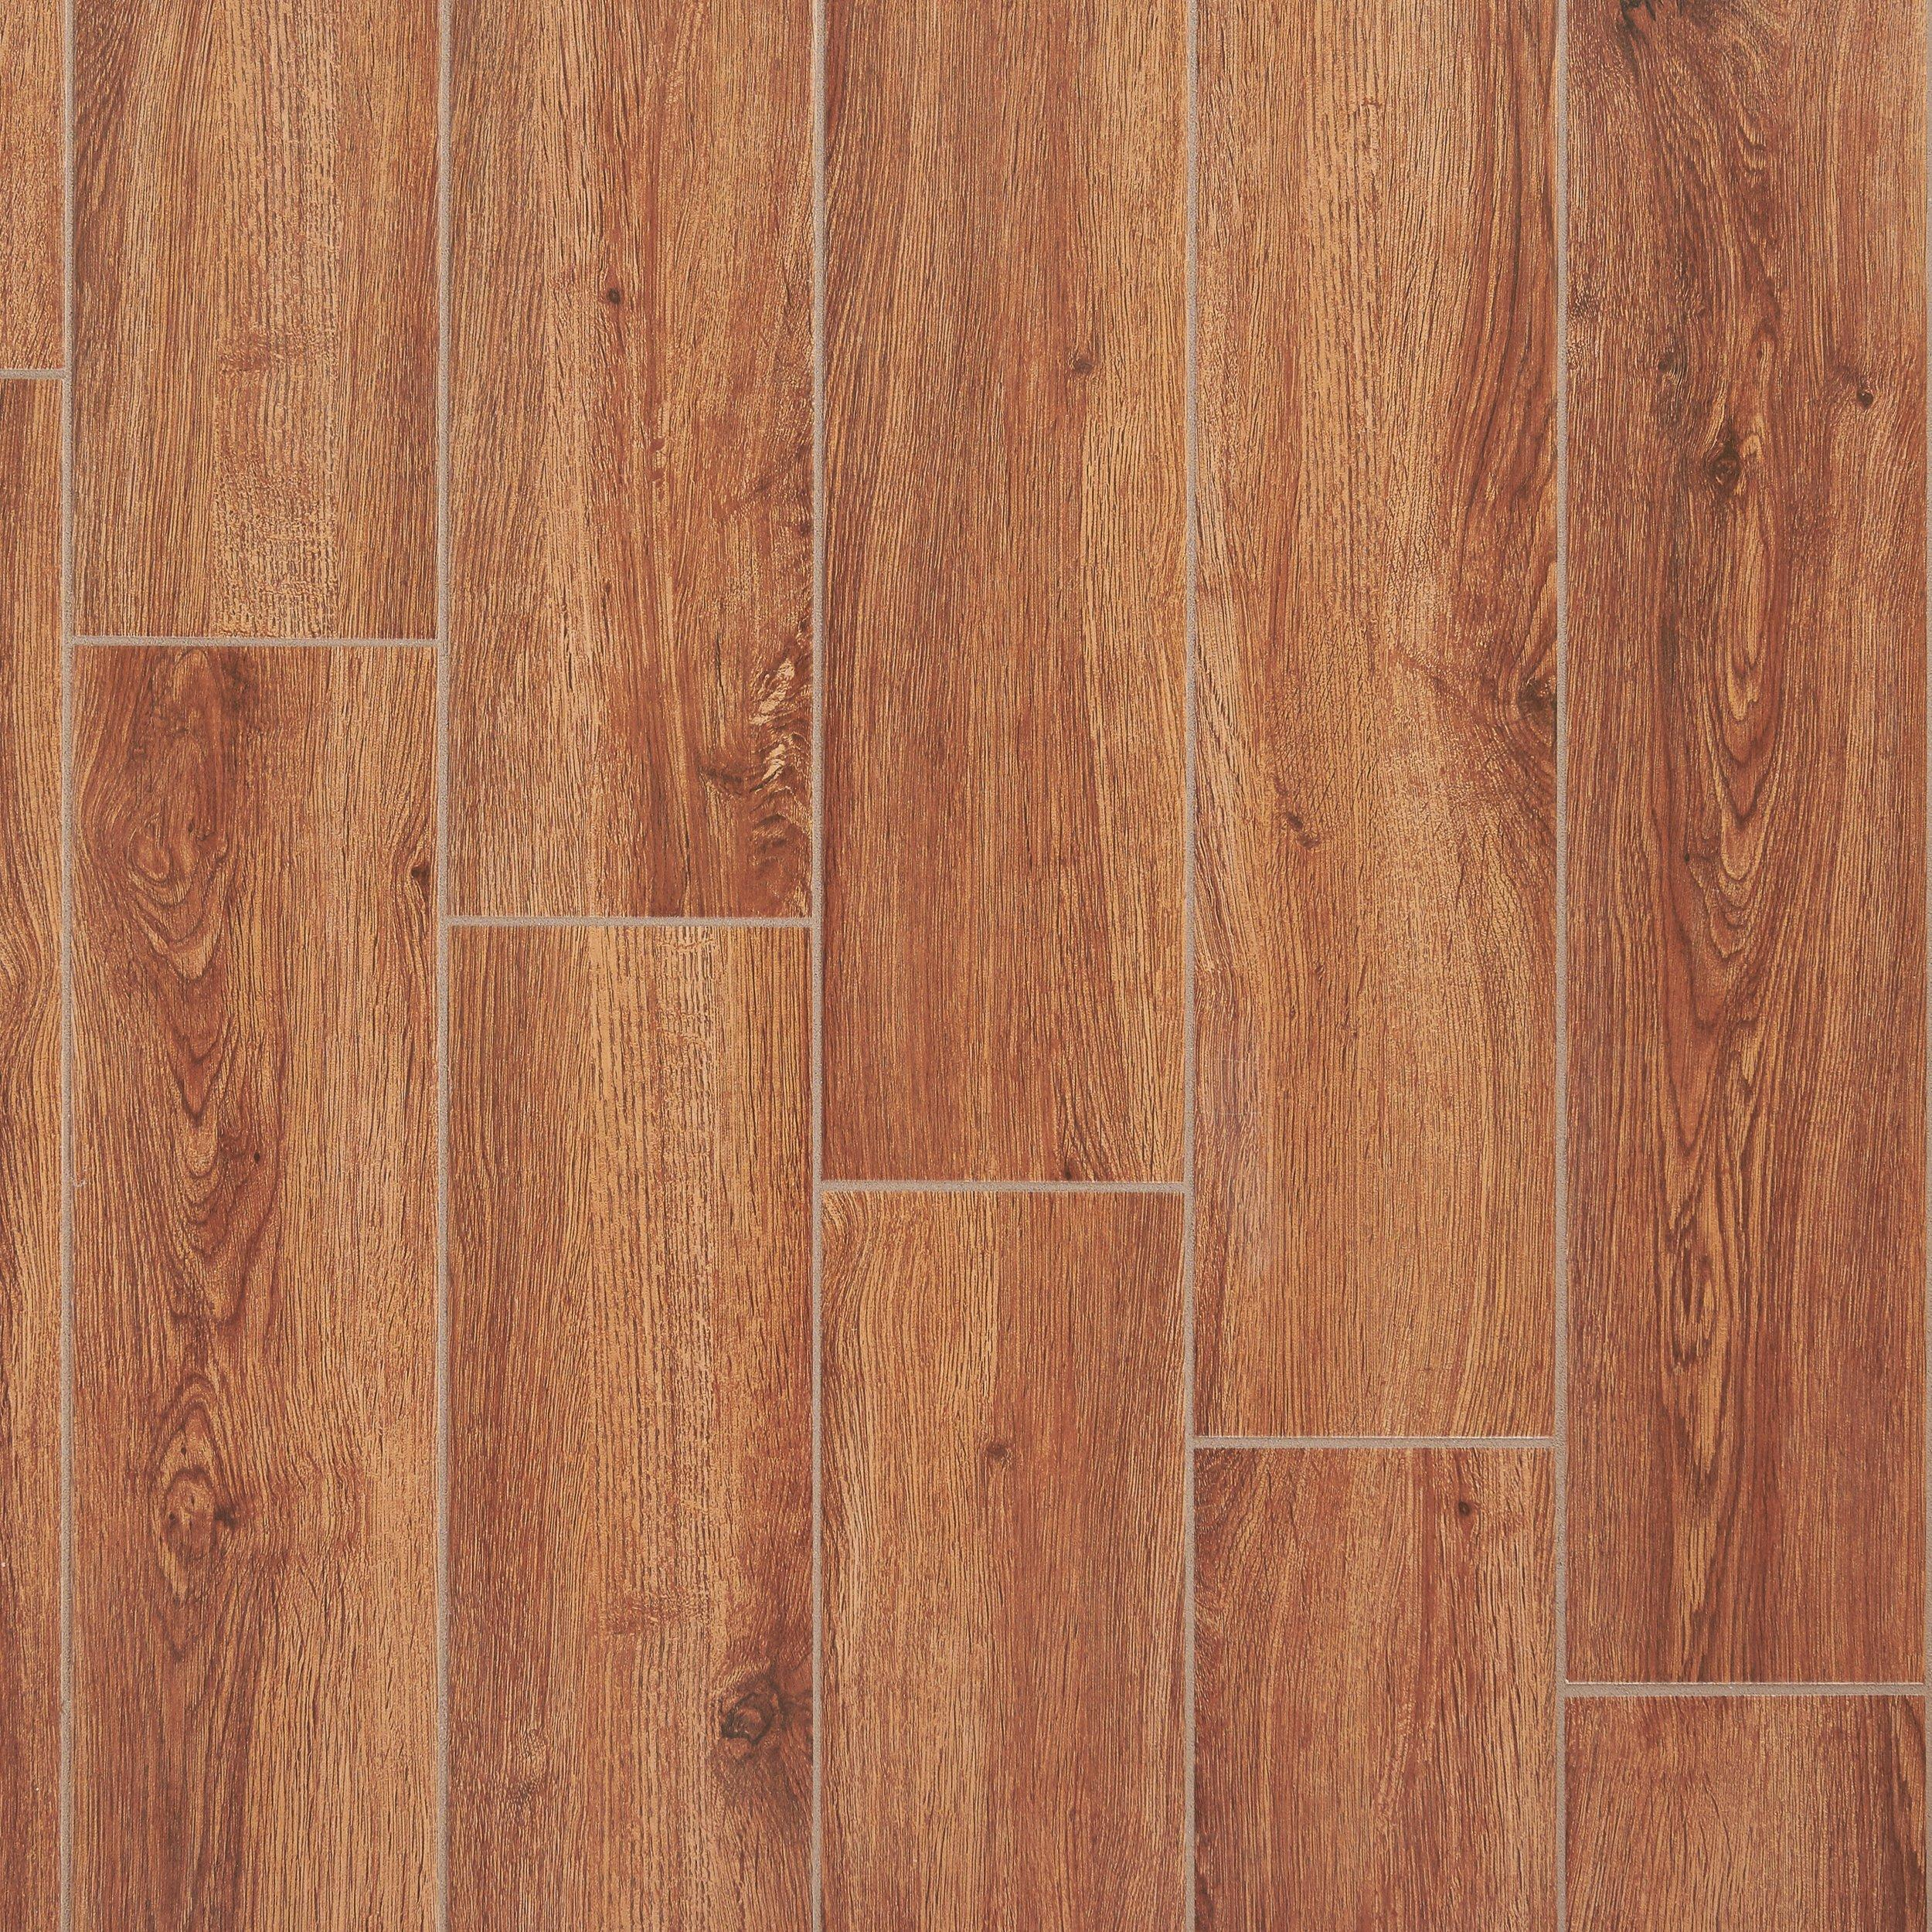 Fulham Red Wood Plank Ceramic Tile 6 x 32 100131457 Floor